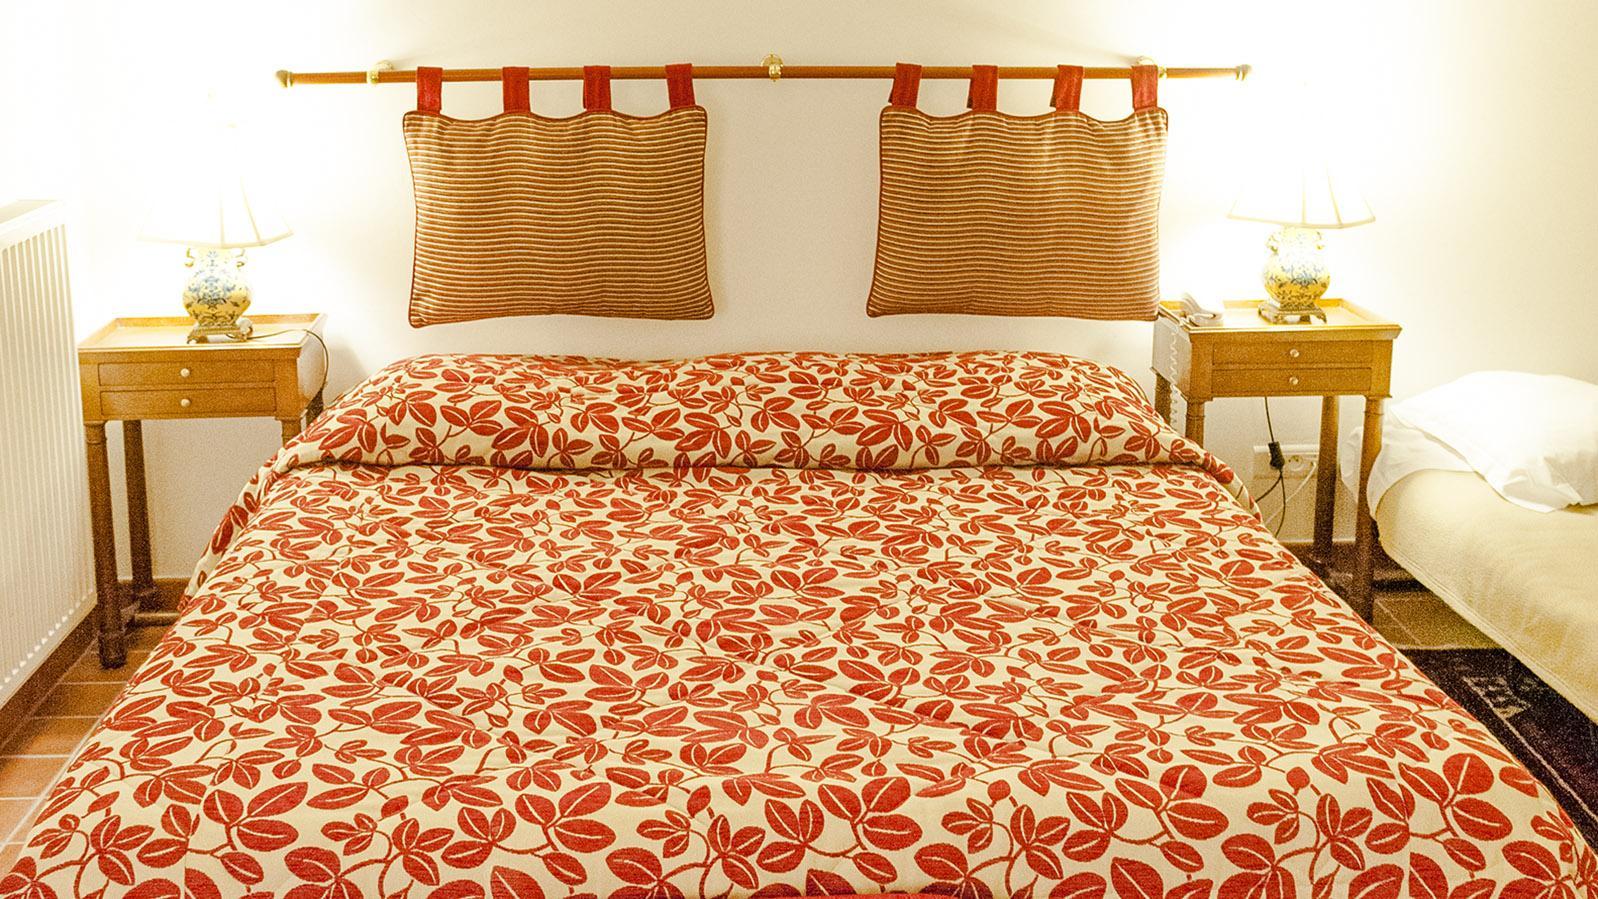 Sedan: ein Zimmer im Burghotel. Foto: Hilke Maunder